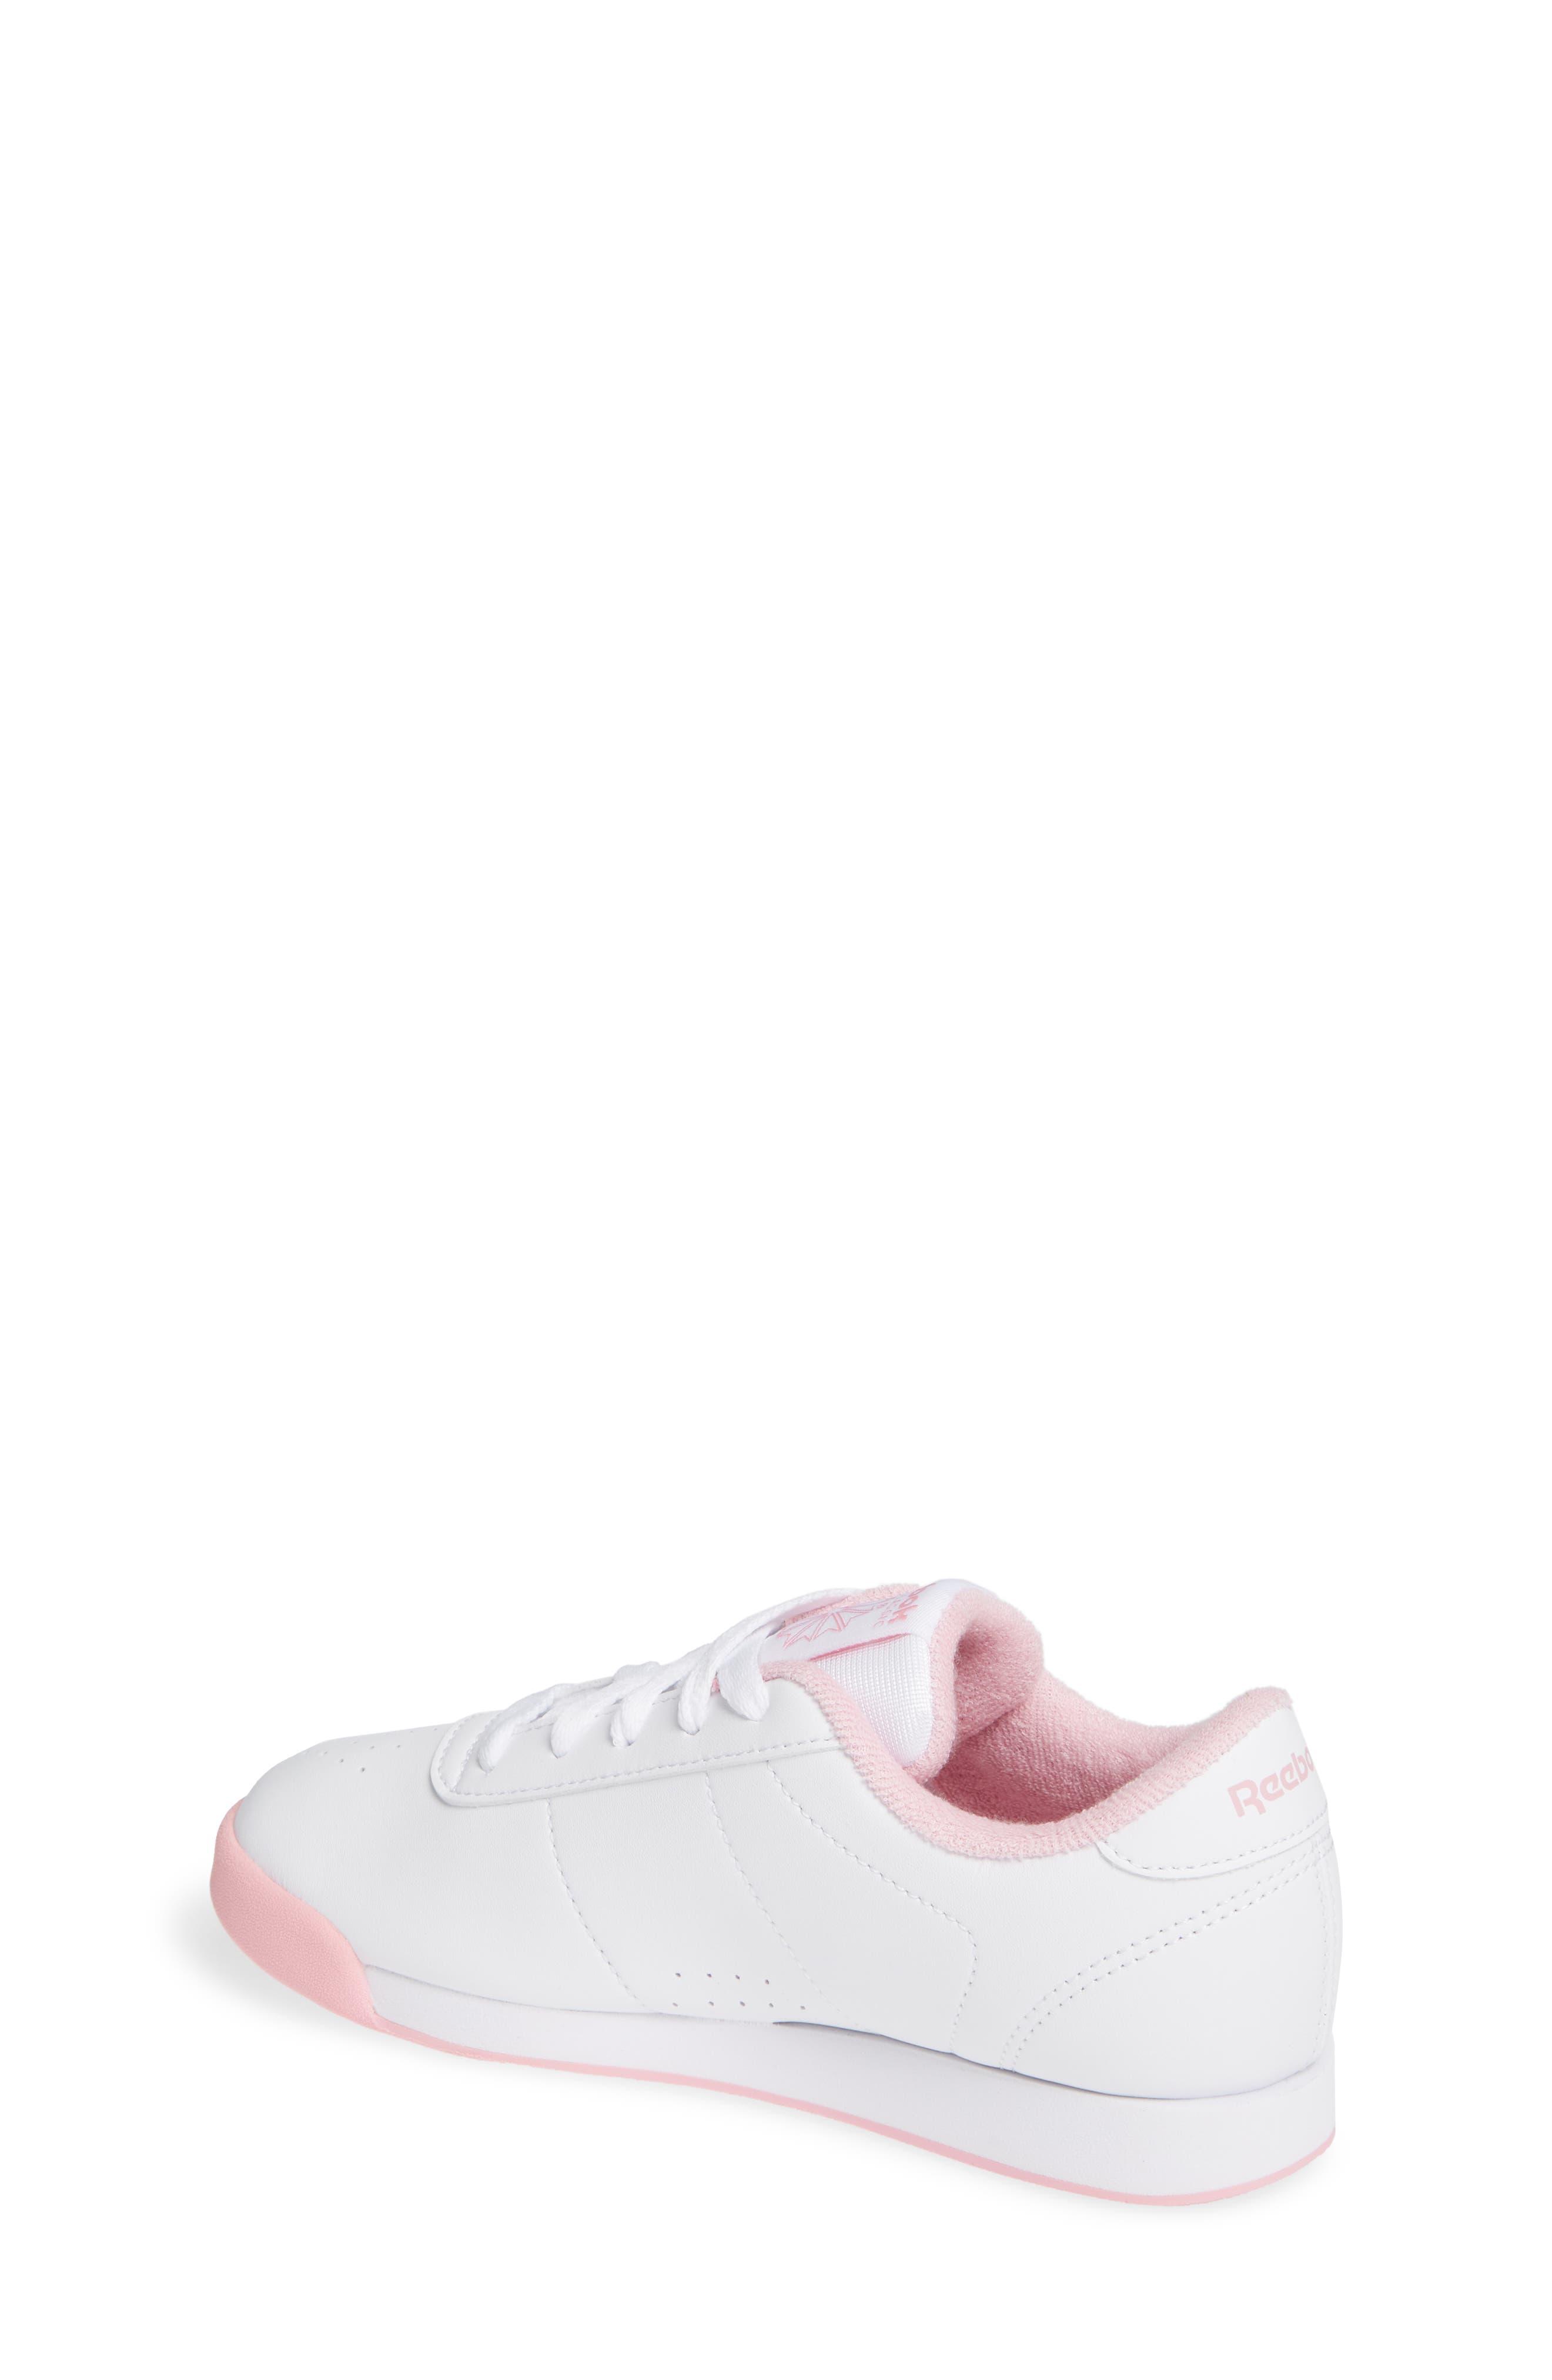 REEBOK,                             Princess Sneaker,                             Alternate thumbnail 2, color,                             100